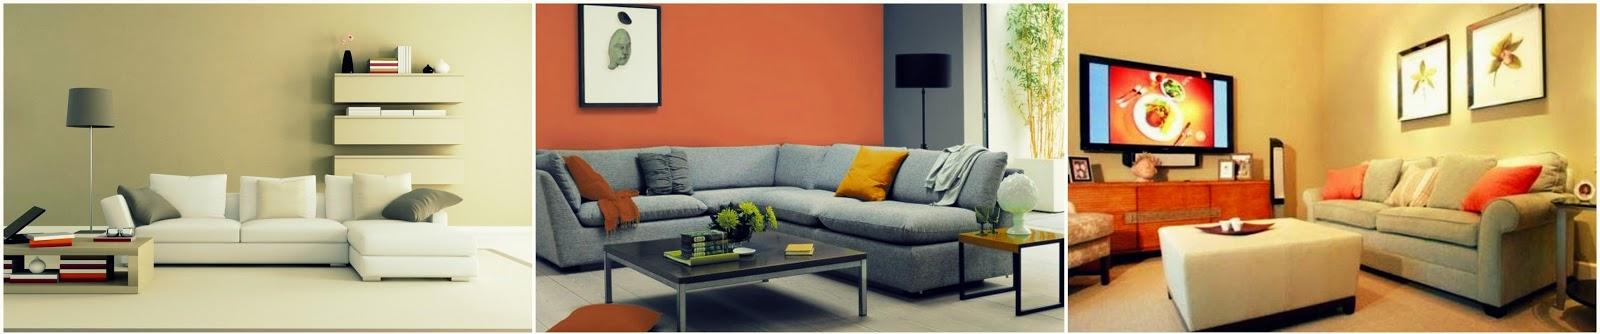 renov ex renovation experts paris. Black Bedroom Furniture Sets. Home Design Ideas